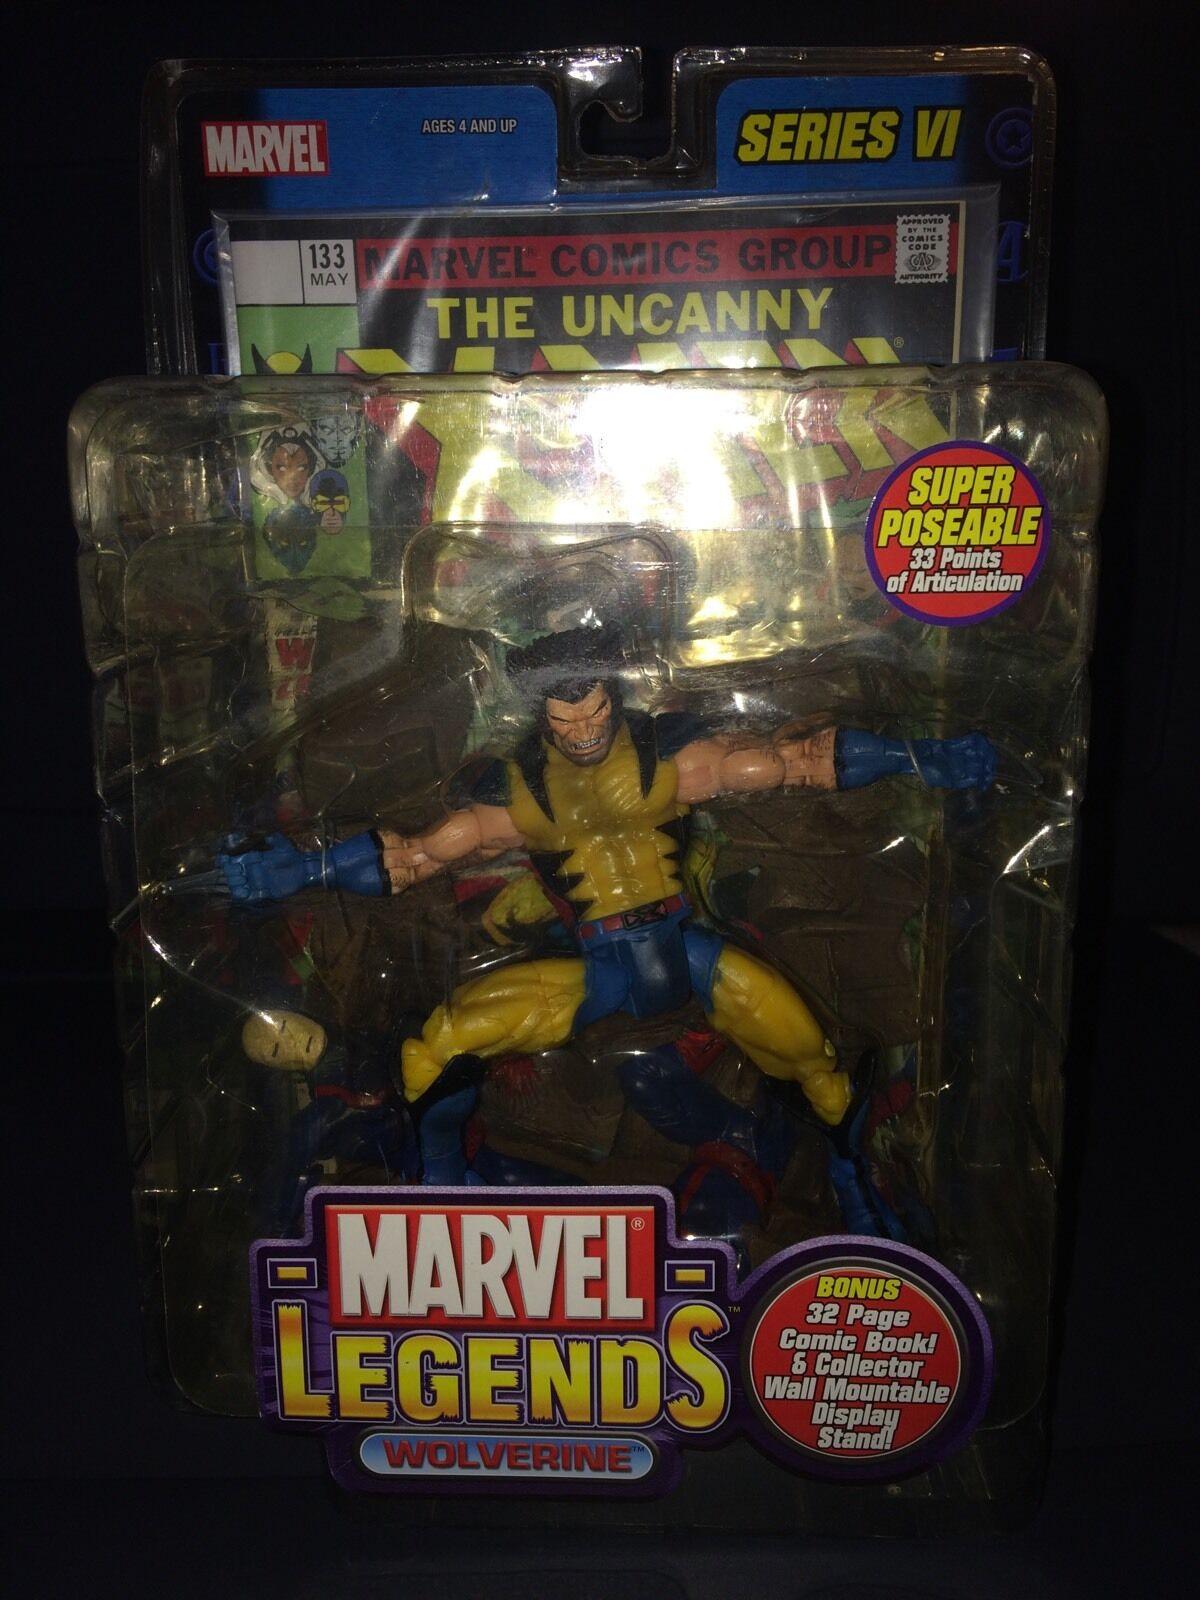 Marvel Legends Wolverine Variant Series VI